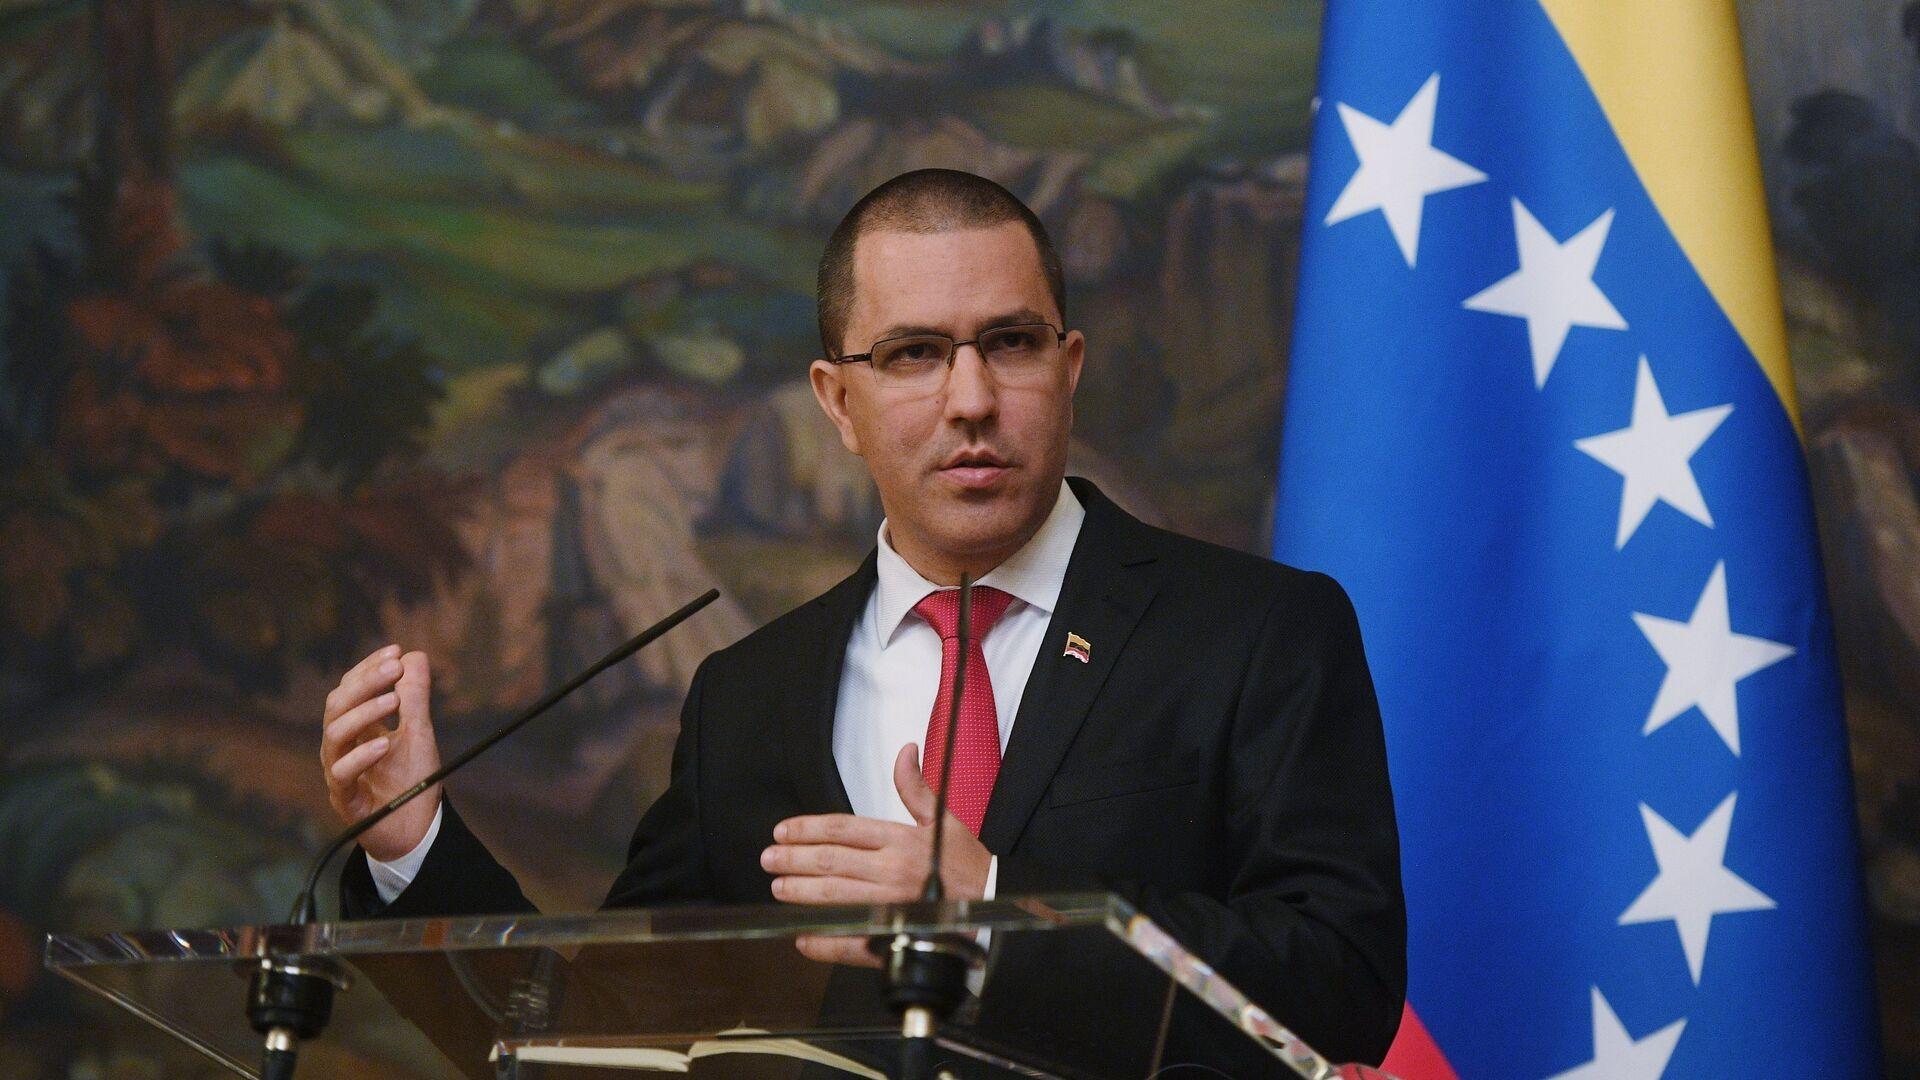 Jorge Arreaza, canciller de Venezuela - Sputnik Mundo, 1920, 23.07.2020